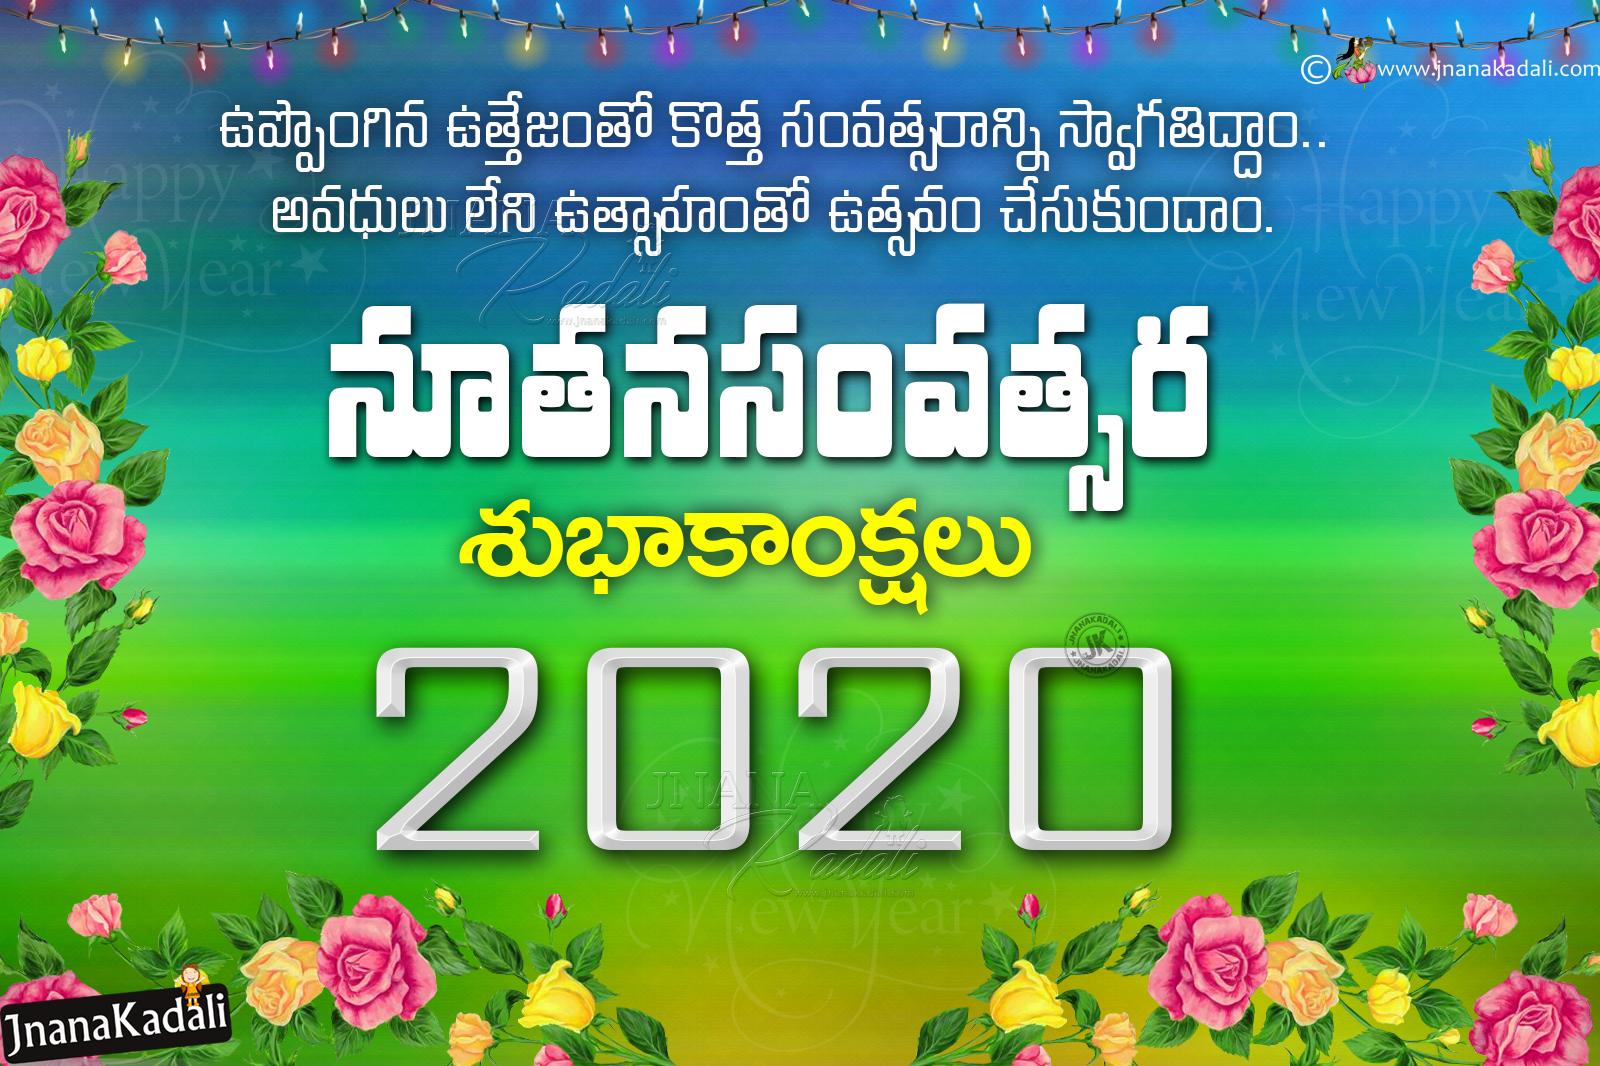 Happy New Year Greetings In Telugu, Telugu New Year - Ugadi Wishes In Telugu 2020 , HD Wallpaper & Backgrounds